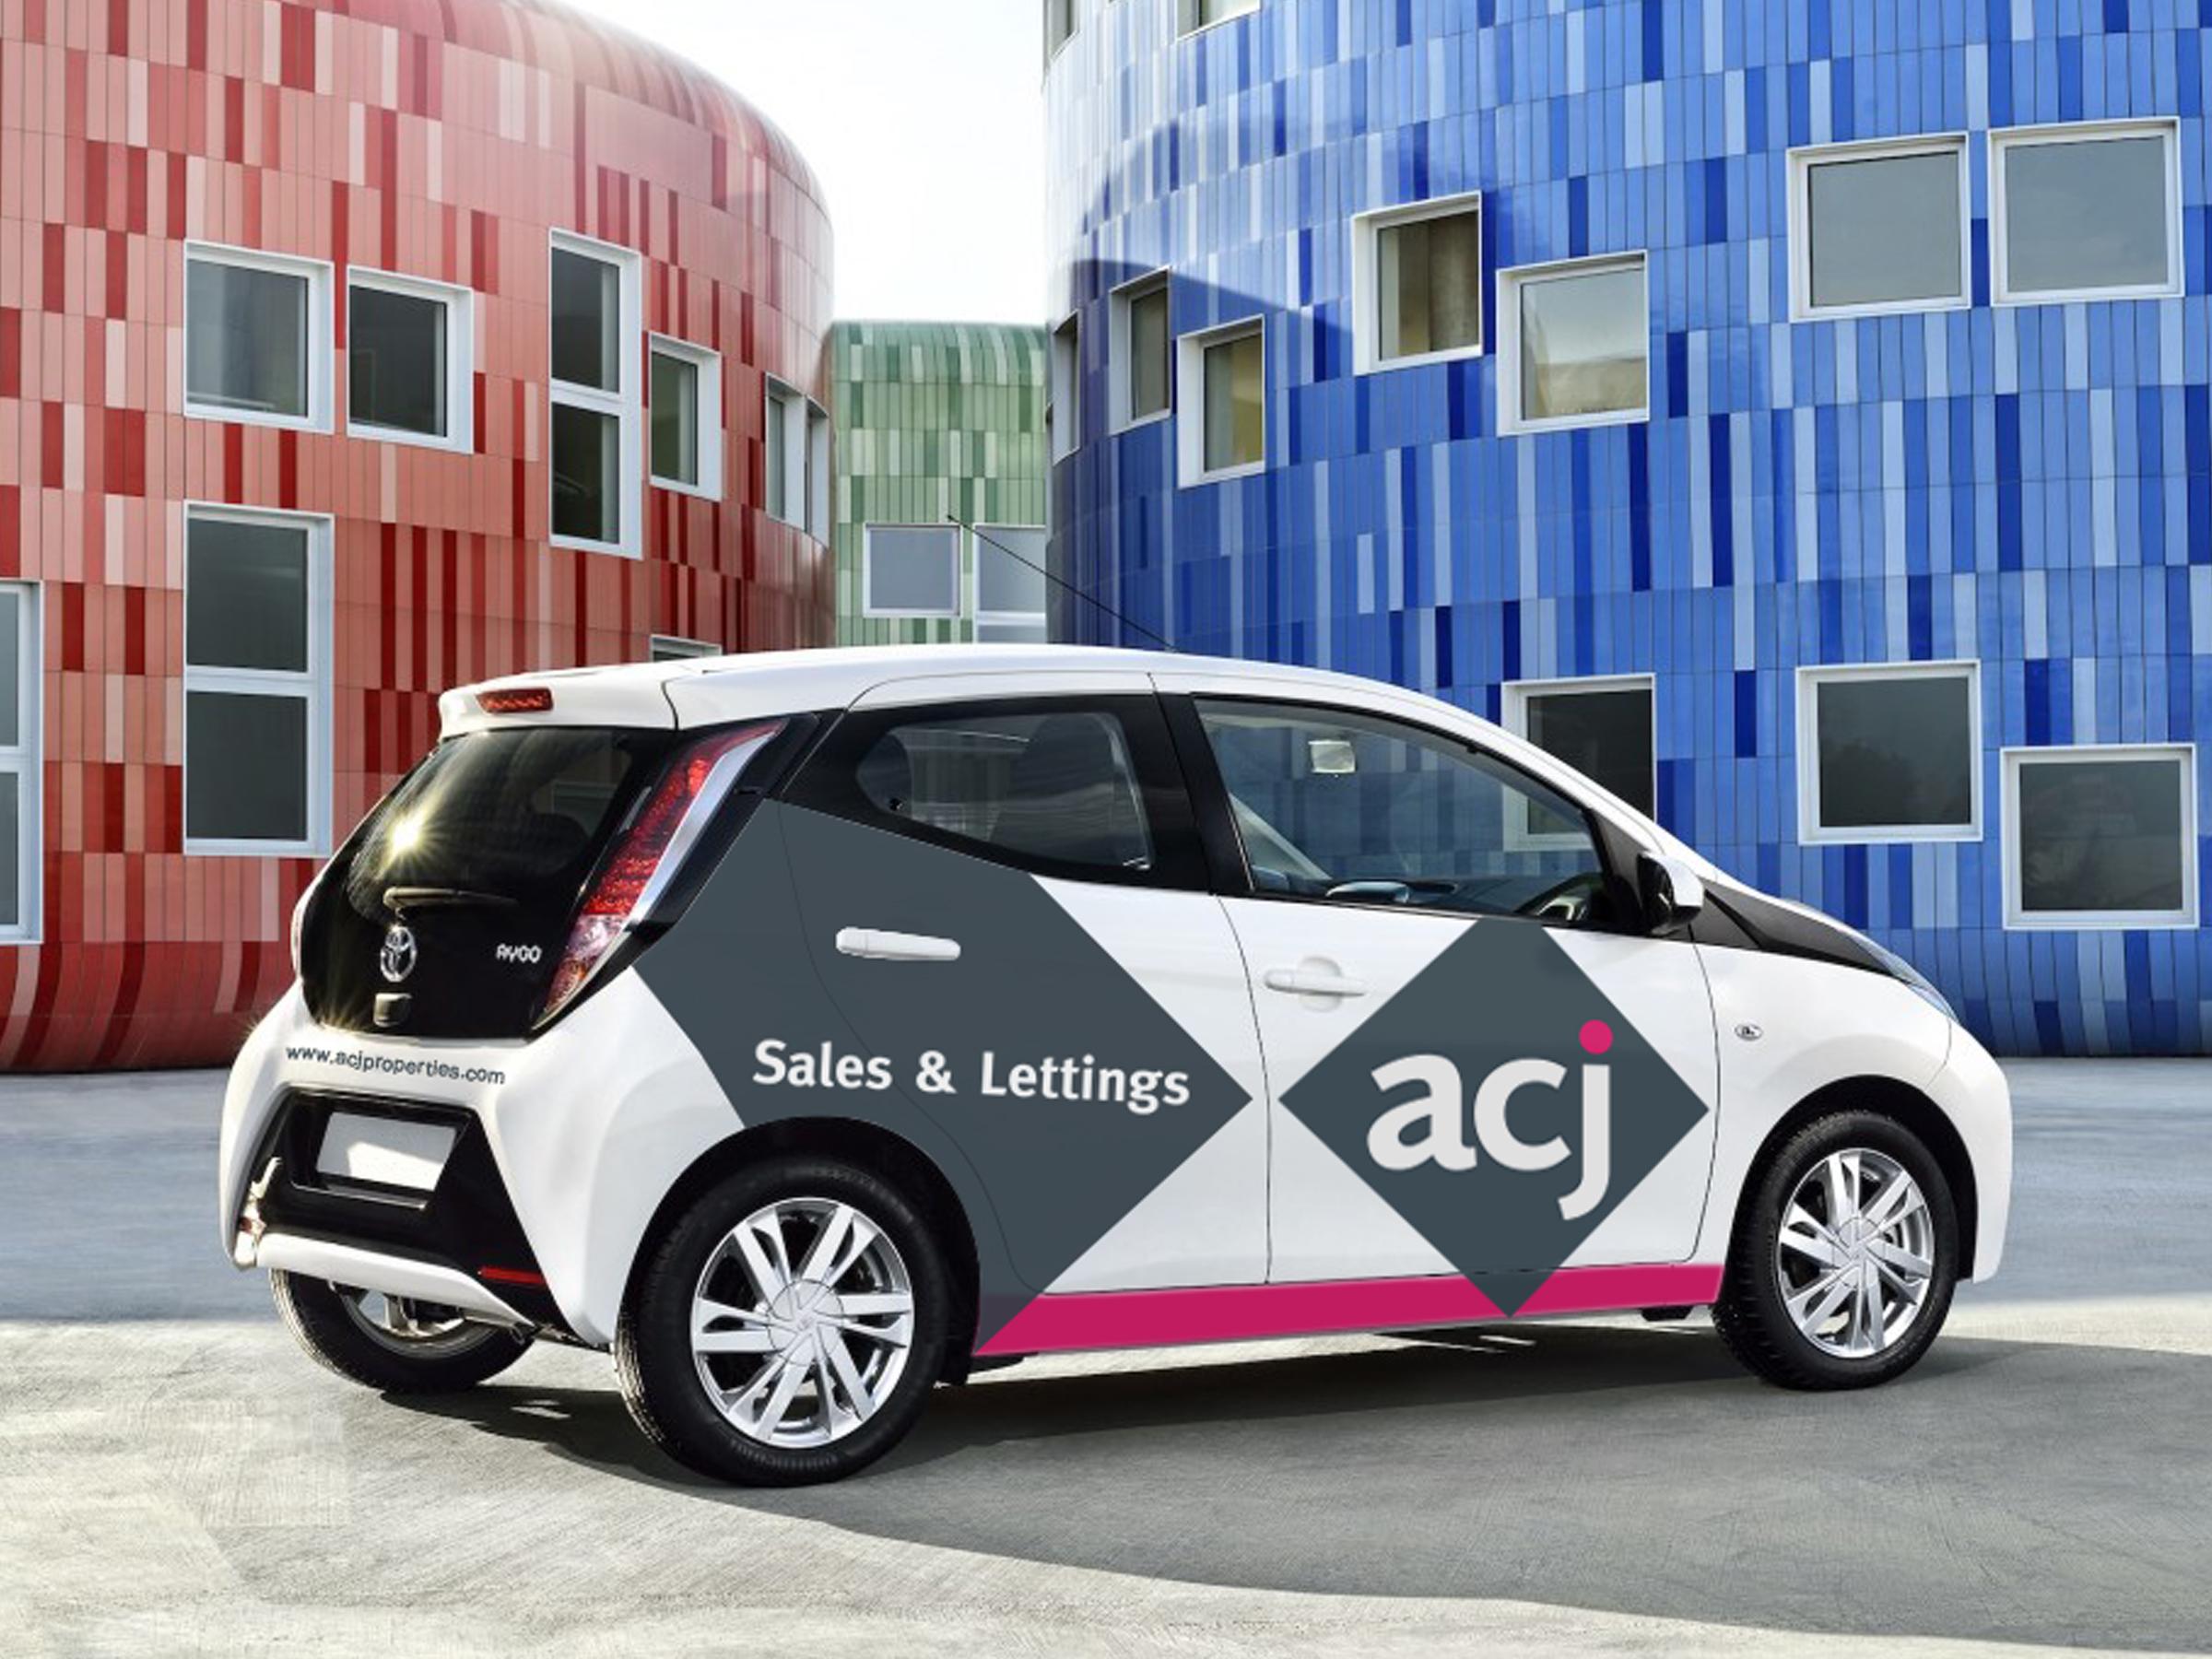 ACJ-Properties_livery.JPG